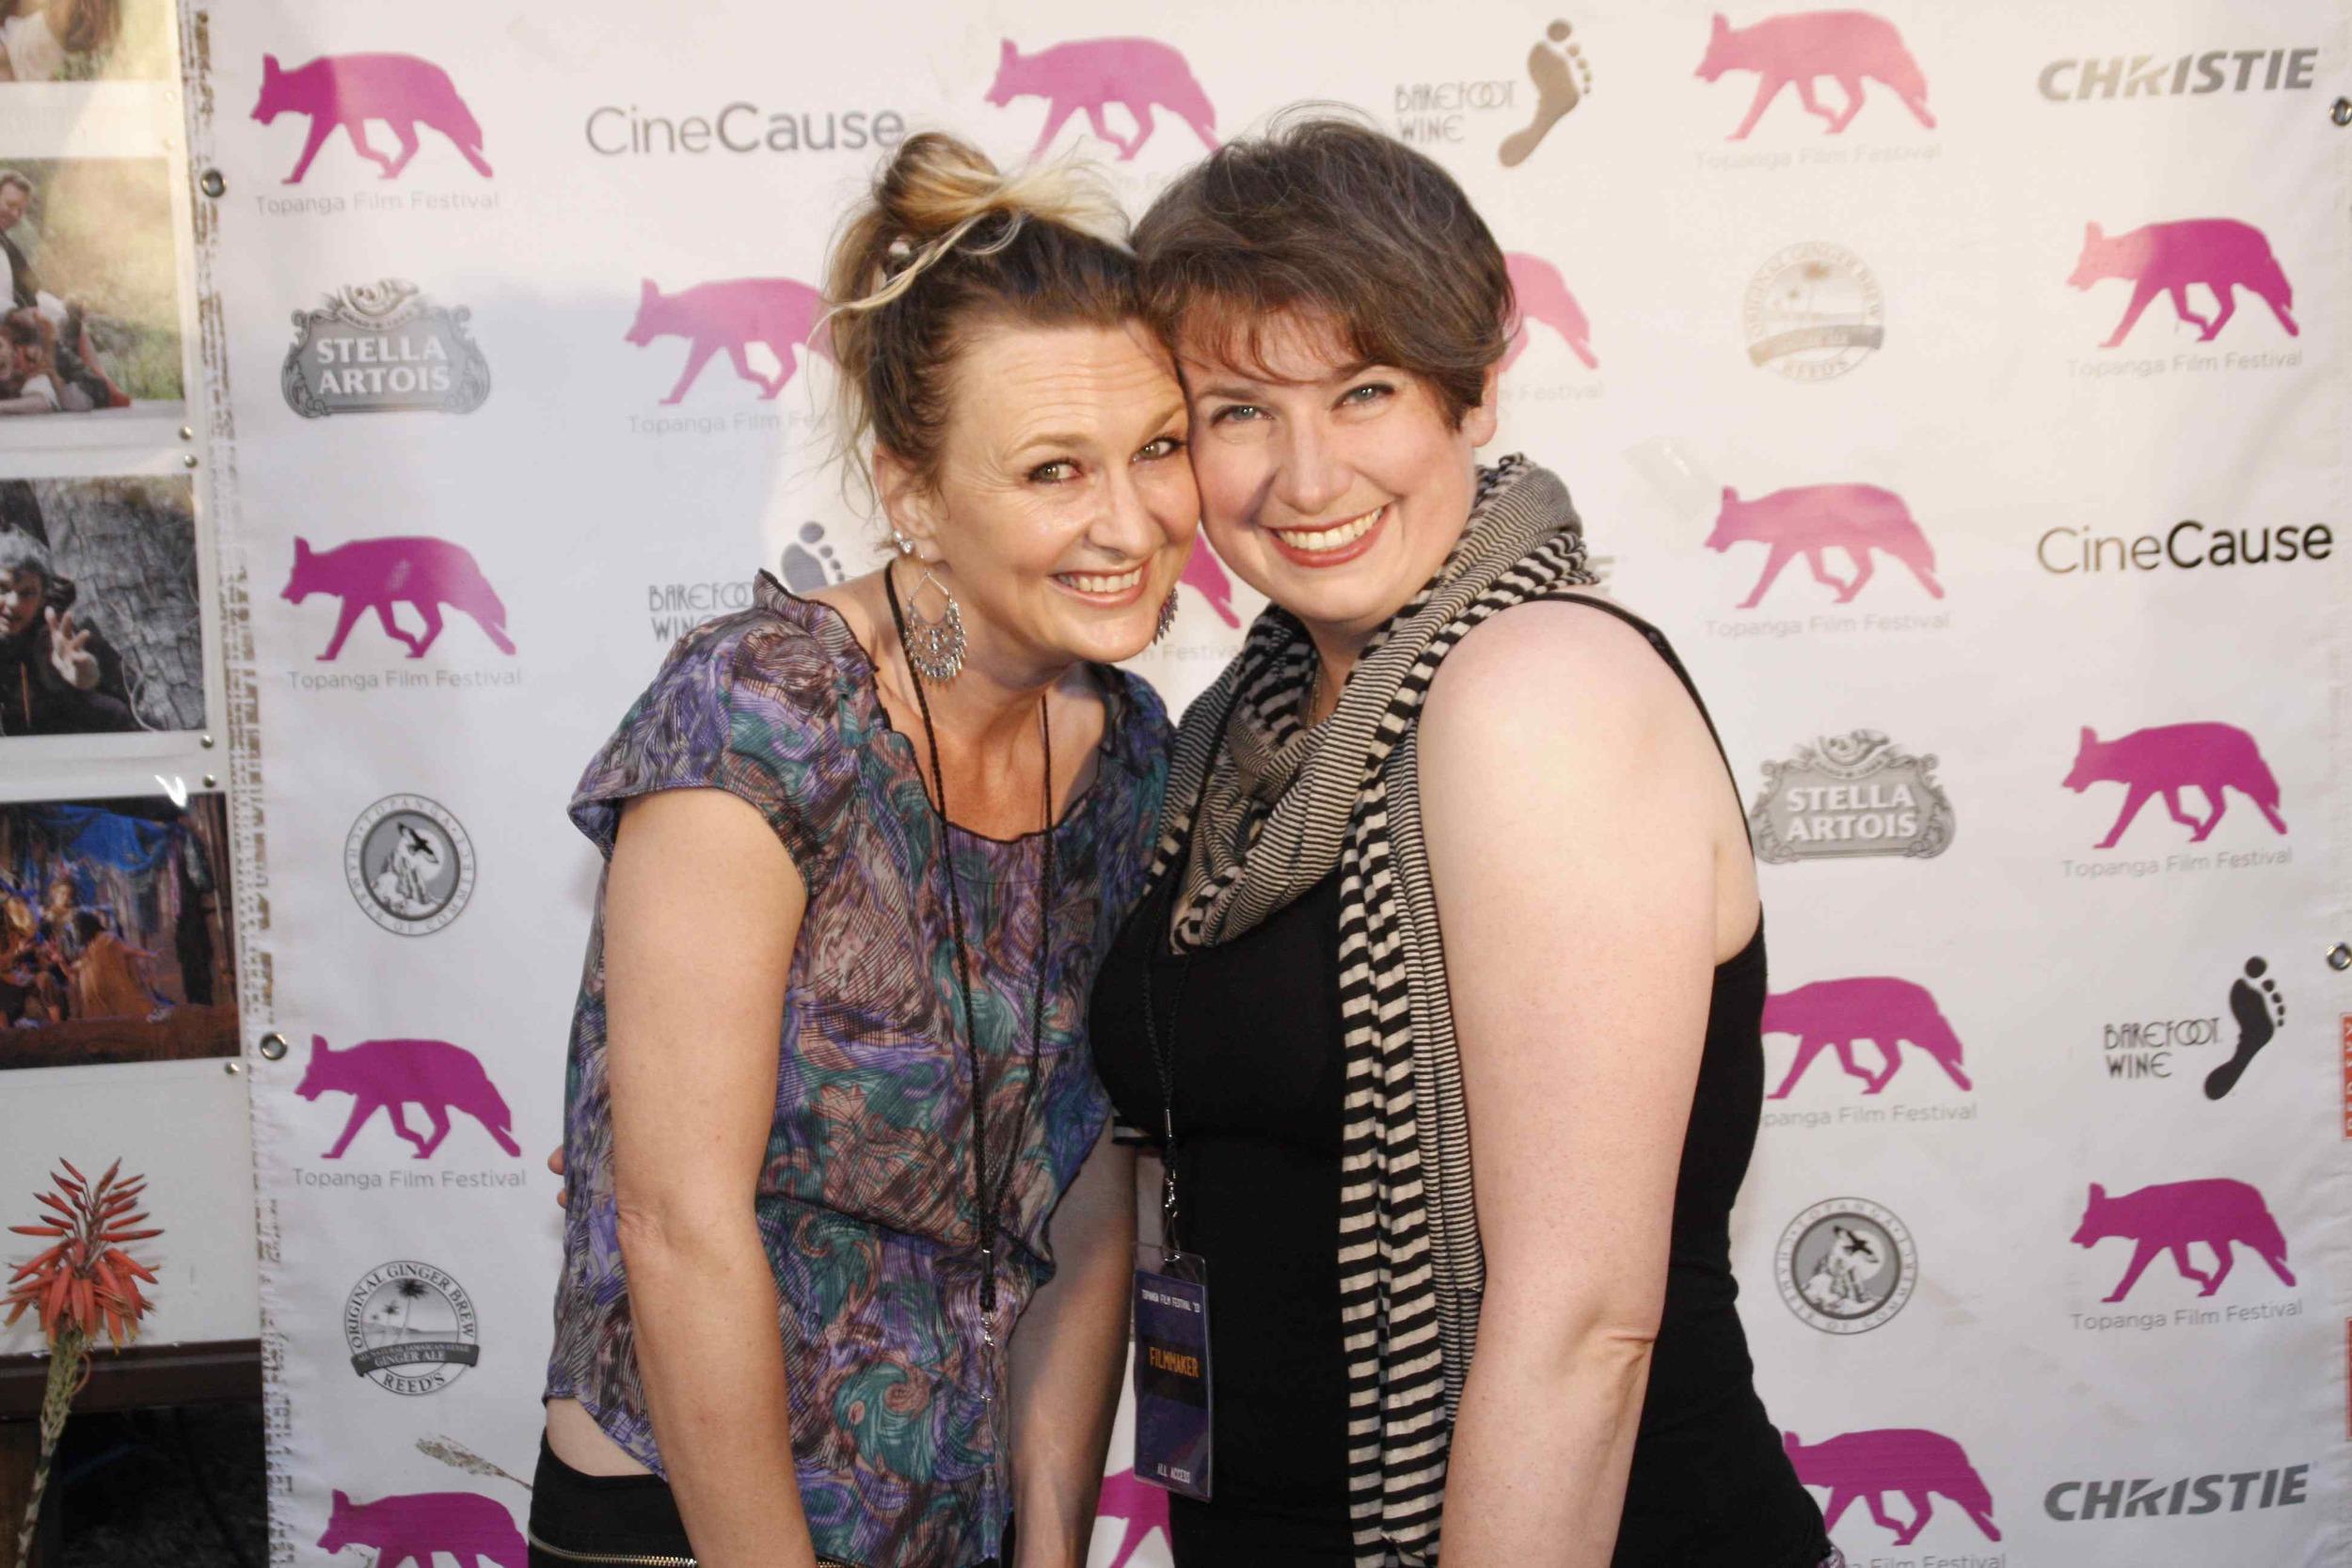 Cari Ann with Erin Maley at the Topanga Film Festival 2013 (a student Cari Ann mentored through ODC Pilot Program)